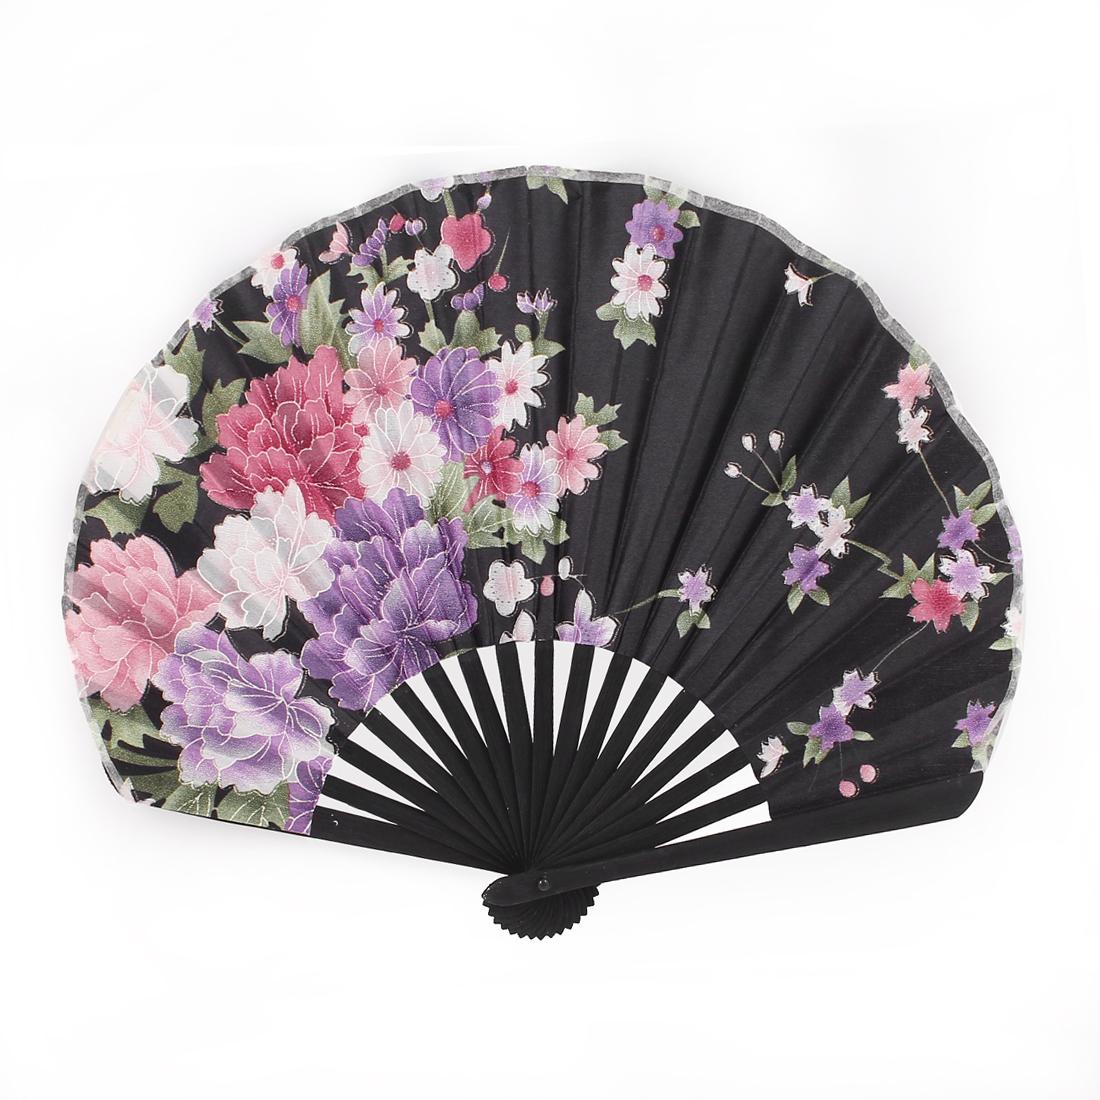 Flowers Print Bamboo Rims Lady Handle Folded Fan Black